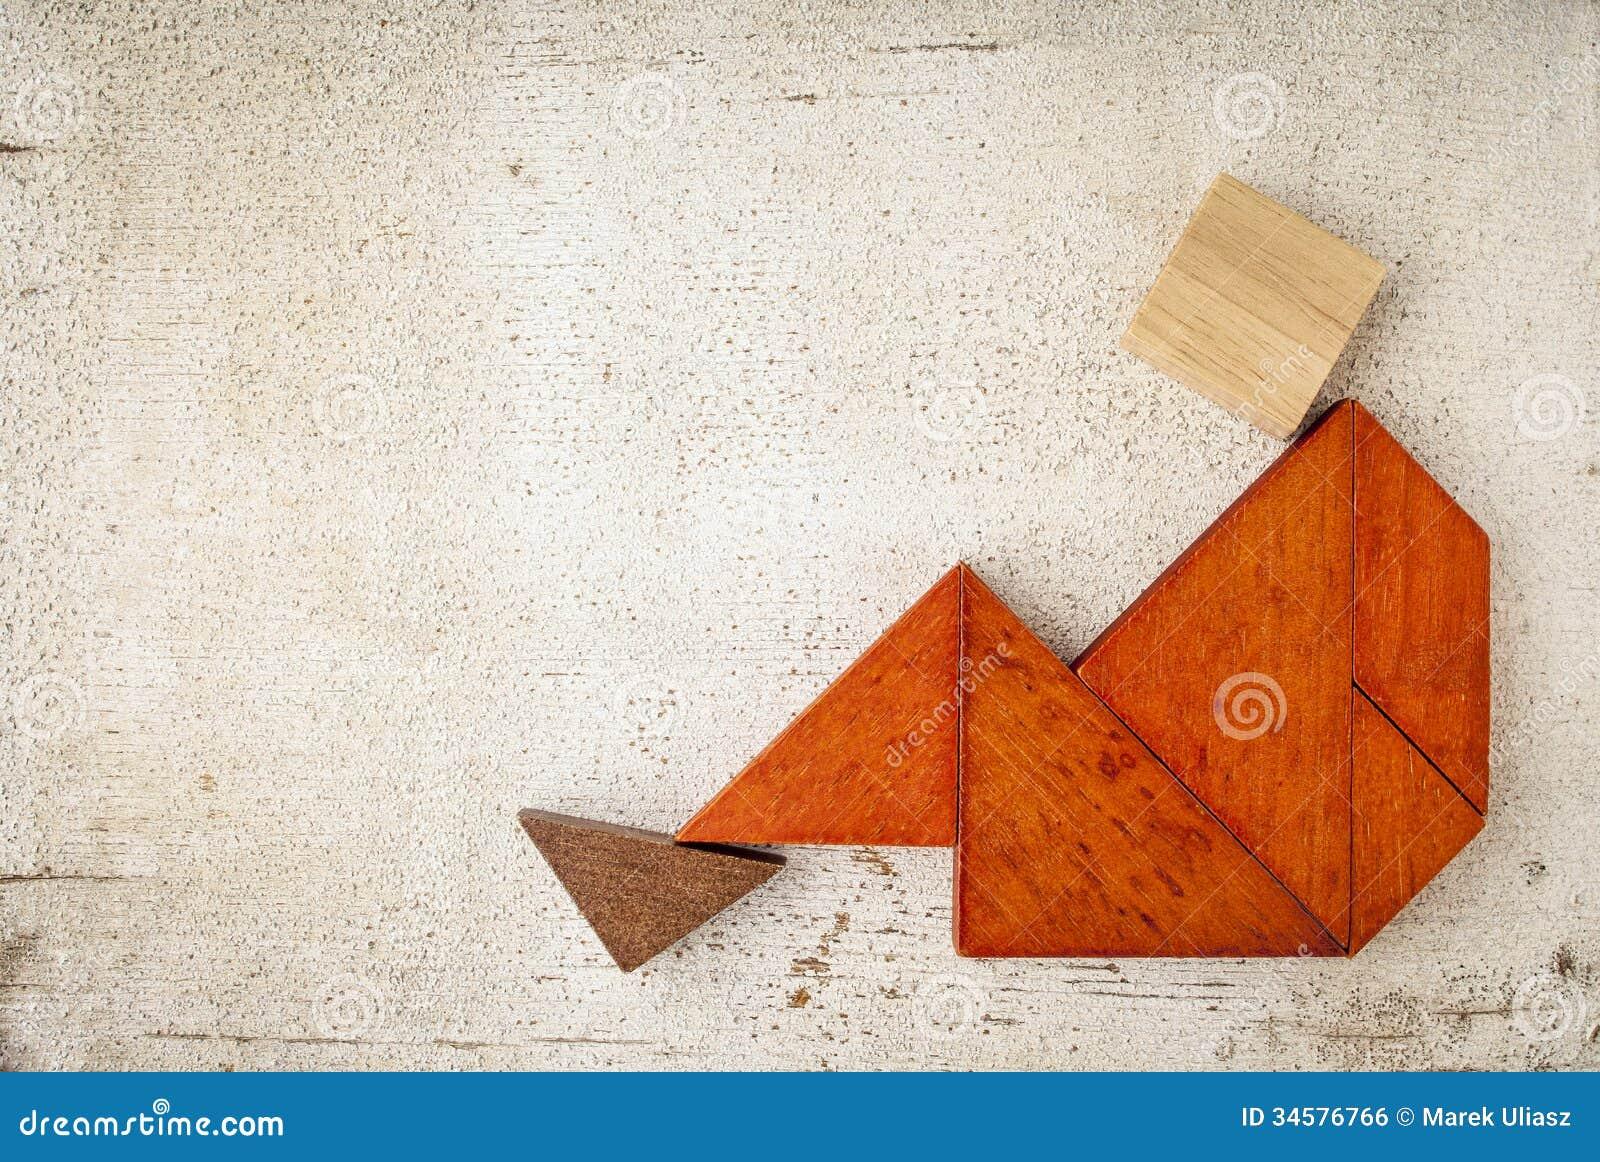 Tangram Sitting Figure Stock Photo Image Of Wood Grunge